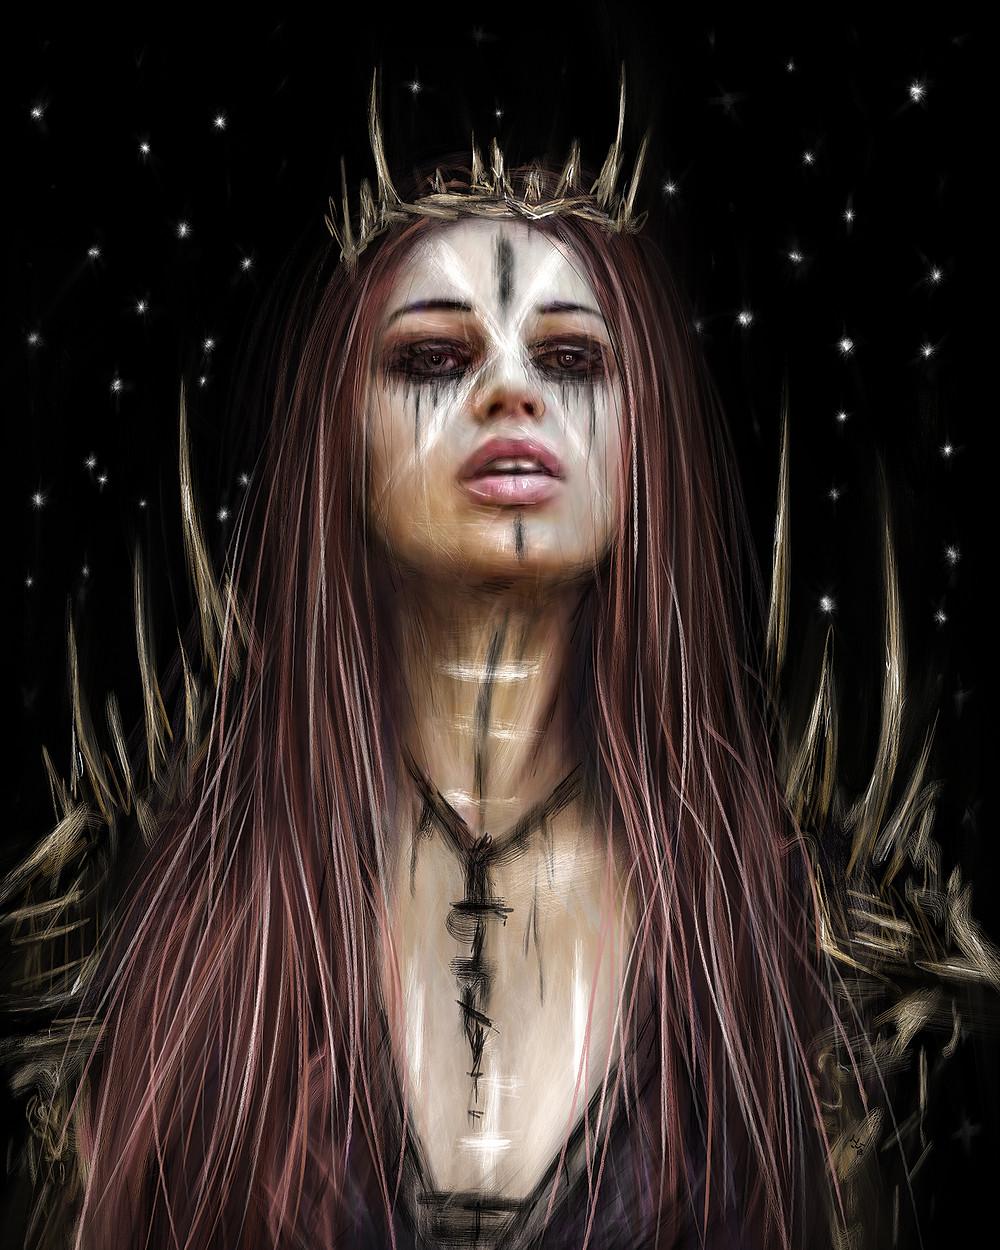 Gothic Fantasy Artwork by Justin Gedak